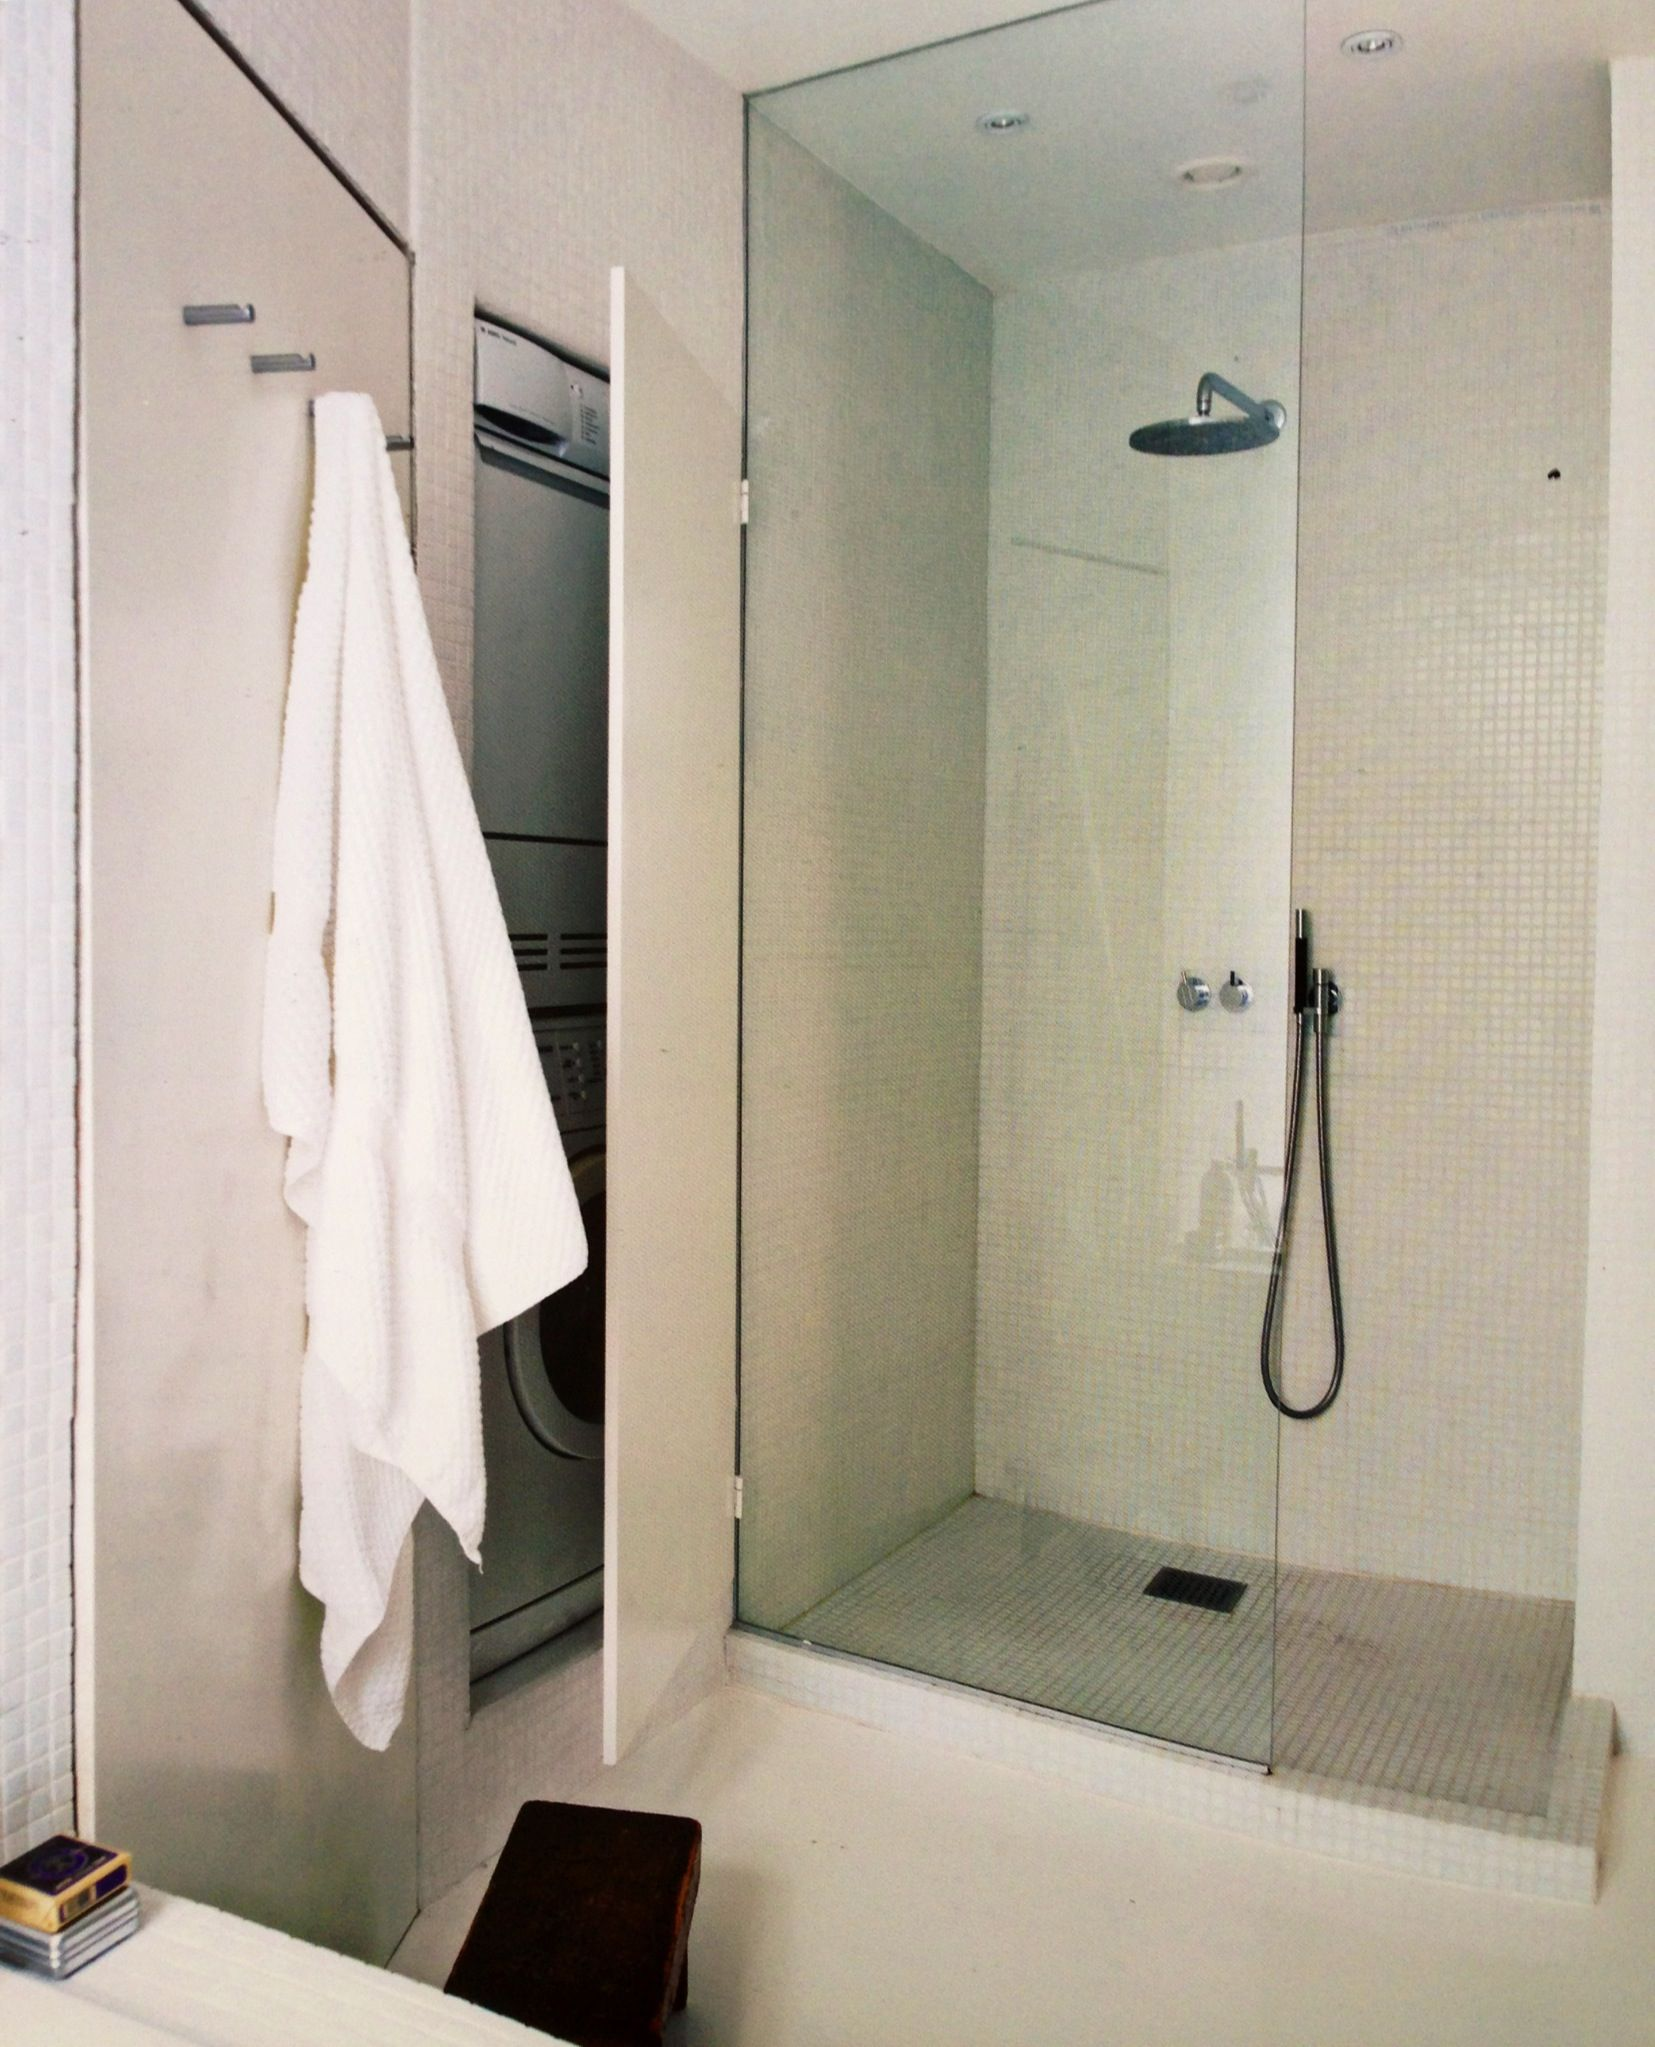 Neat hide the washing machine home decor bathroom for Bathroom designs with washing machine